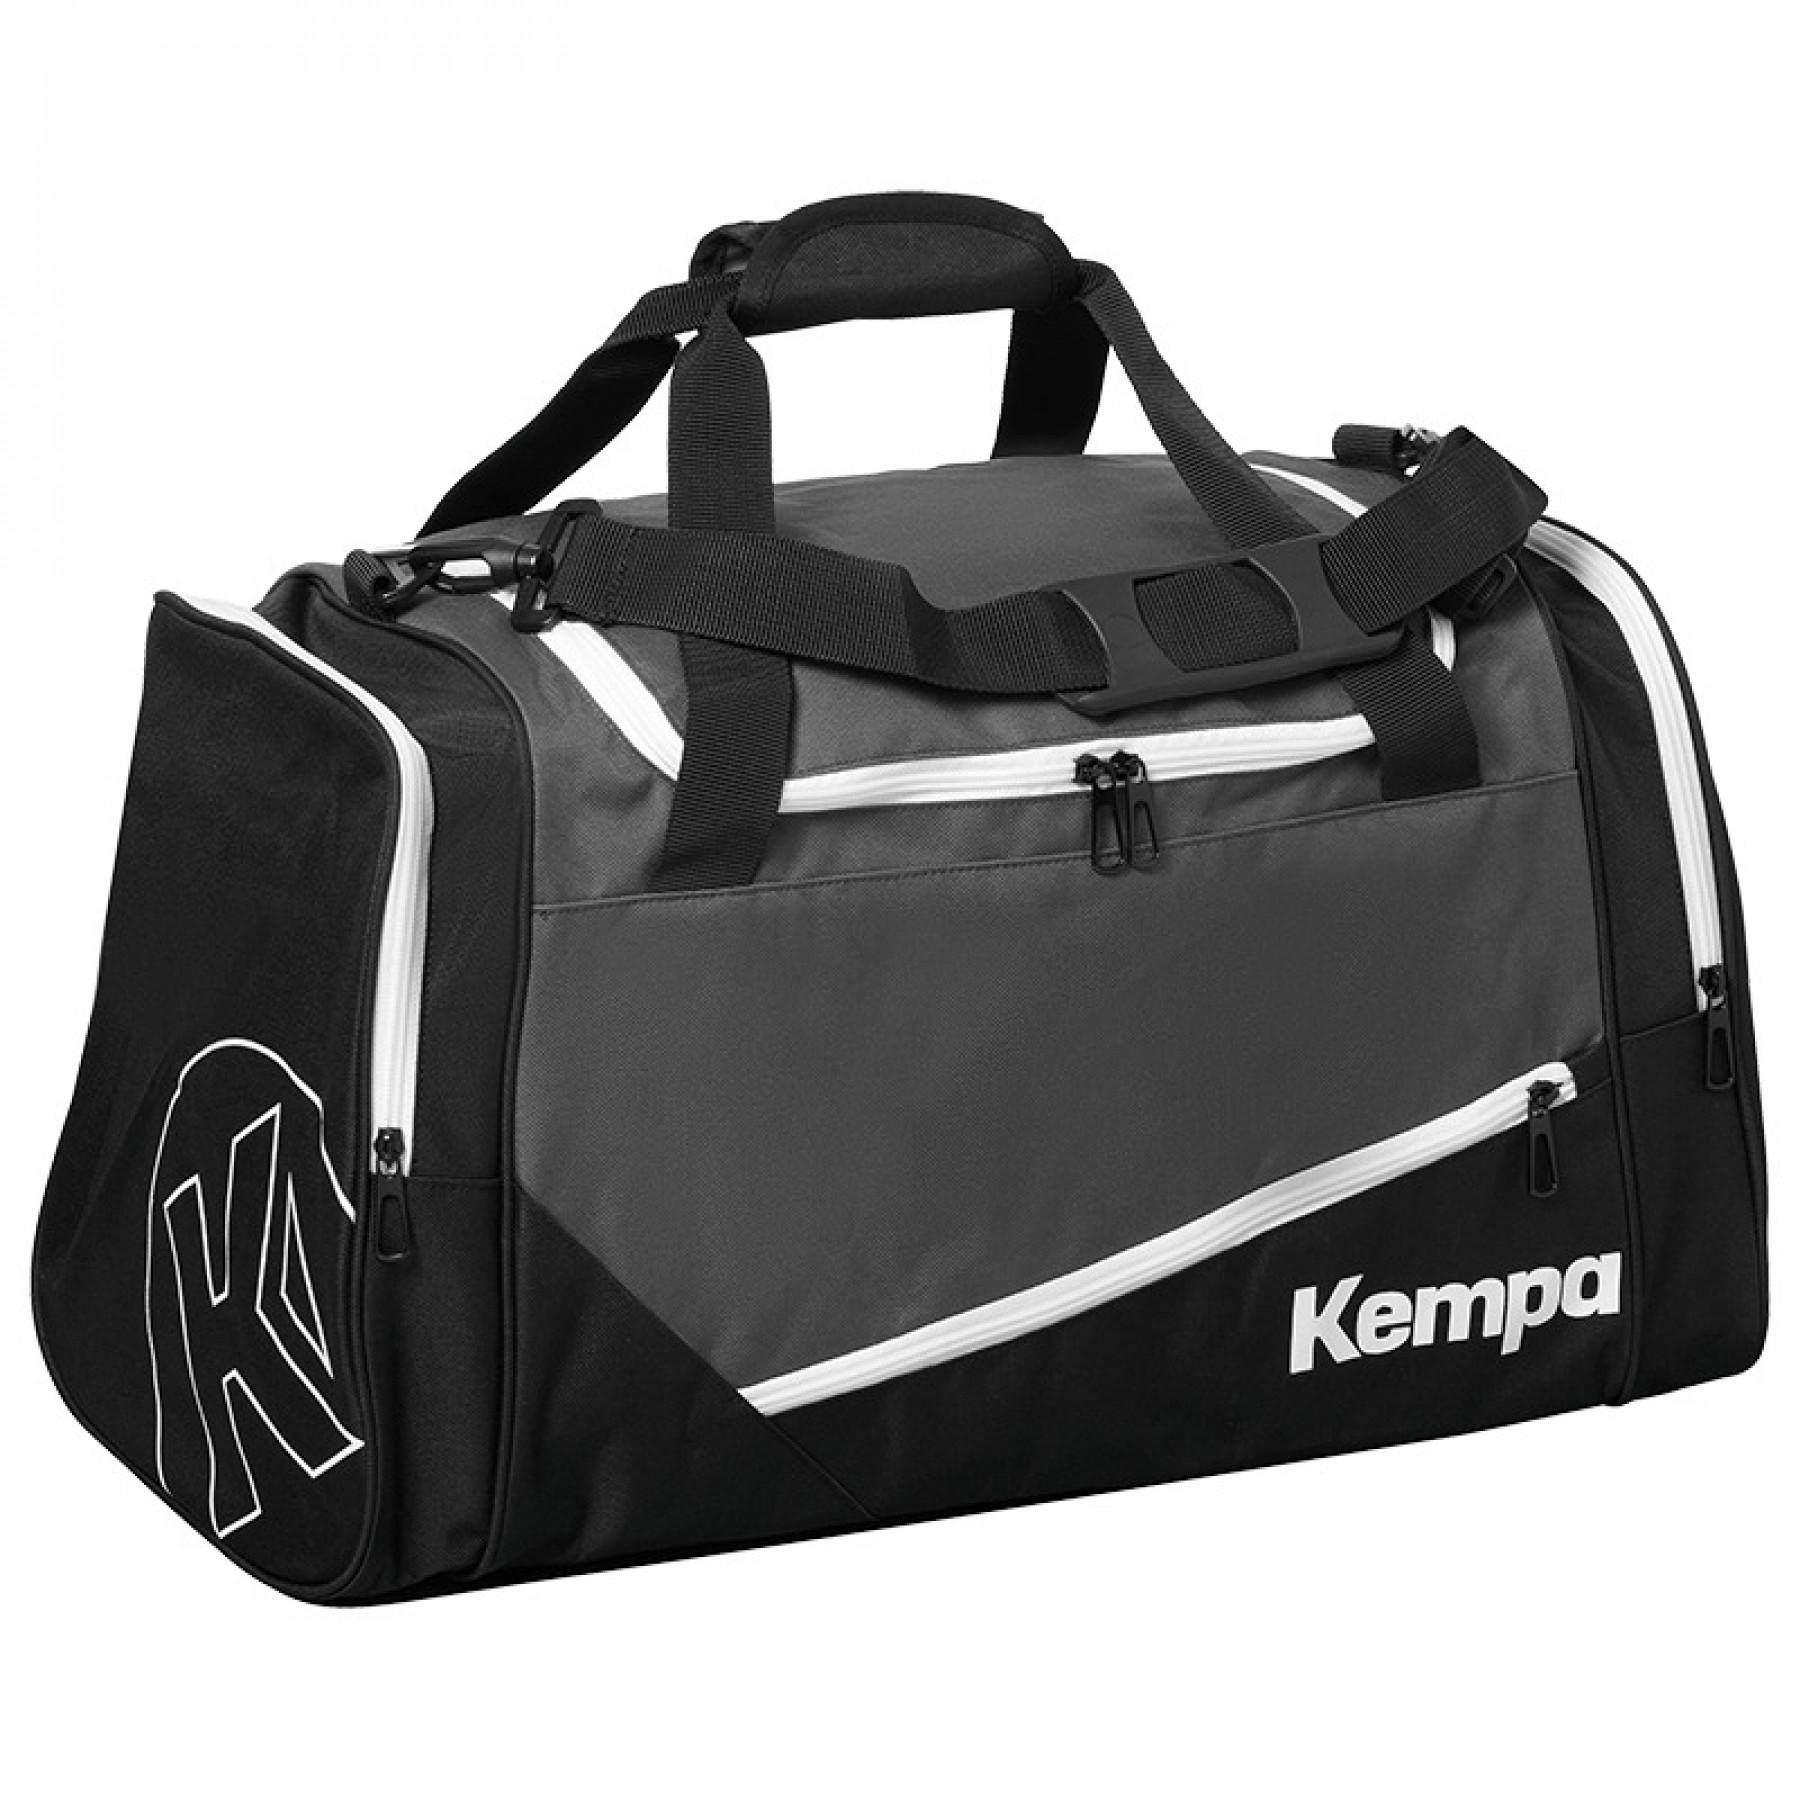 Sports bag Kempa Noir/XL